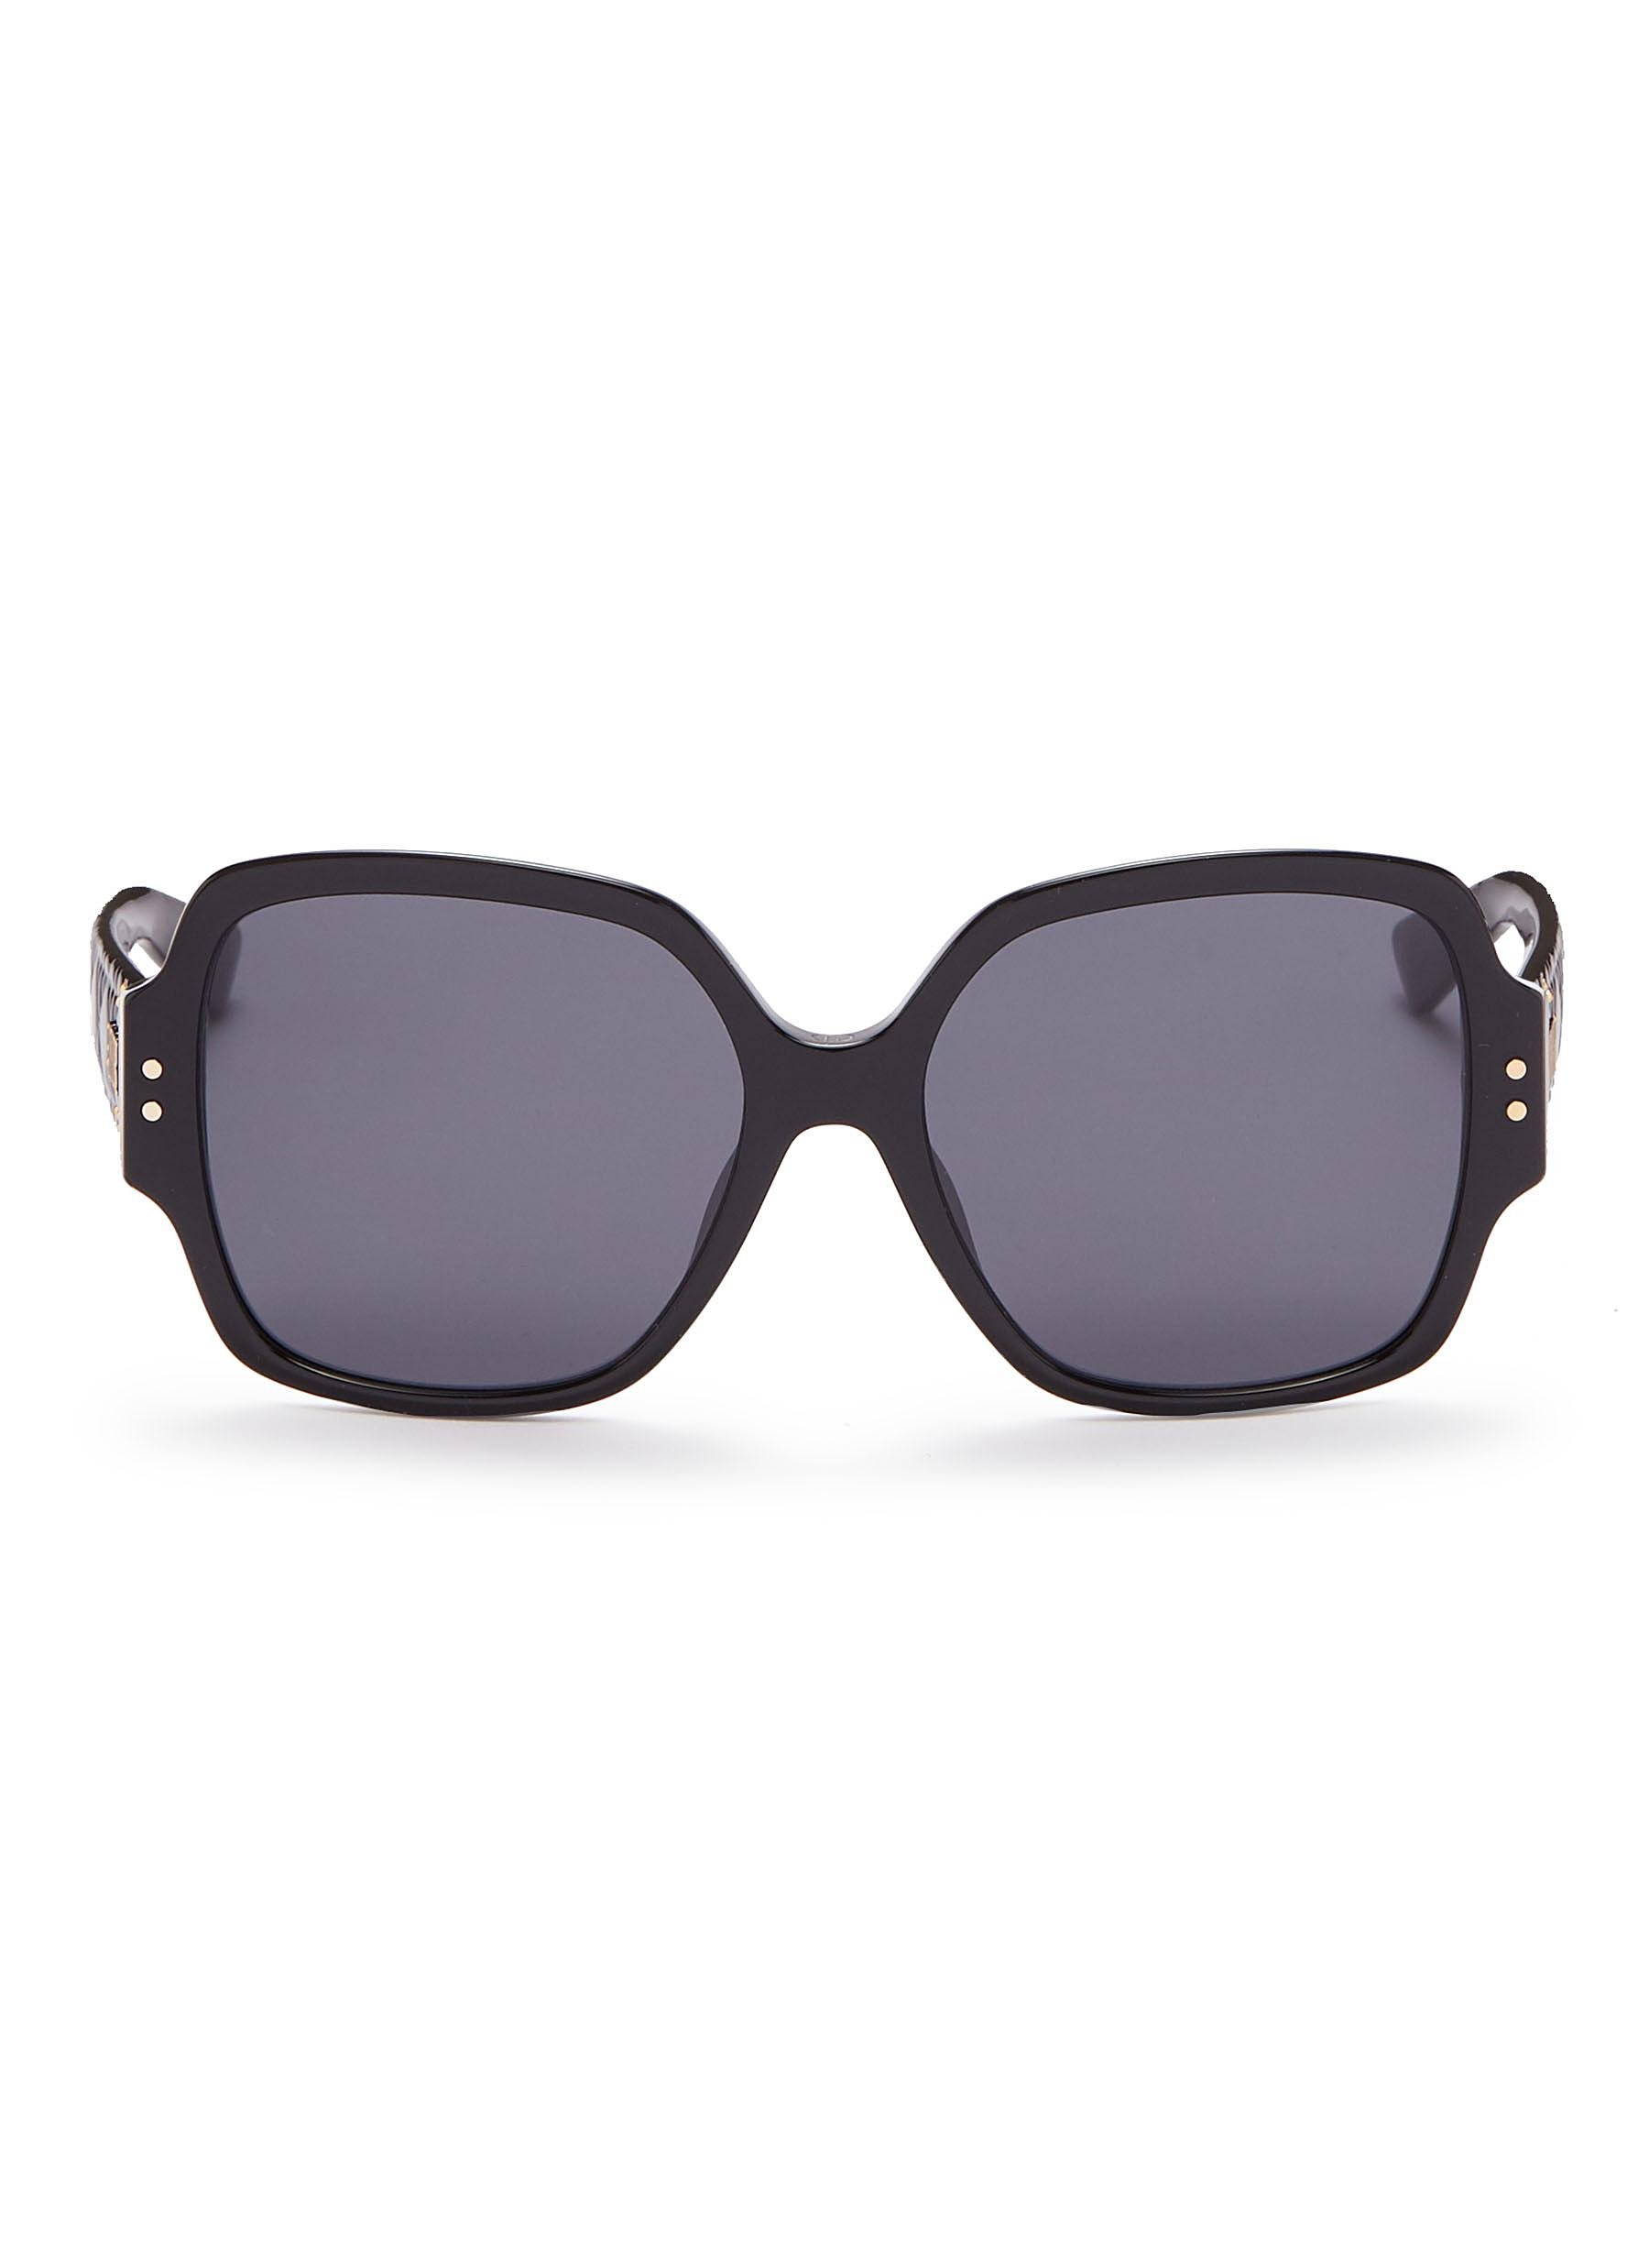 e7104a018877 Dior.  Lady Dior Studs  acetate square sunglasses